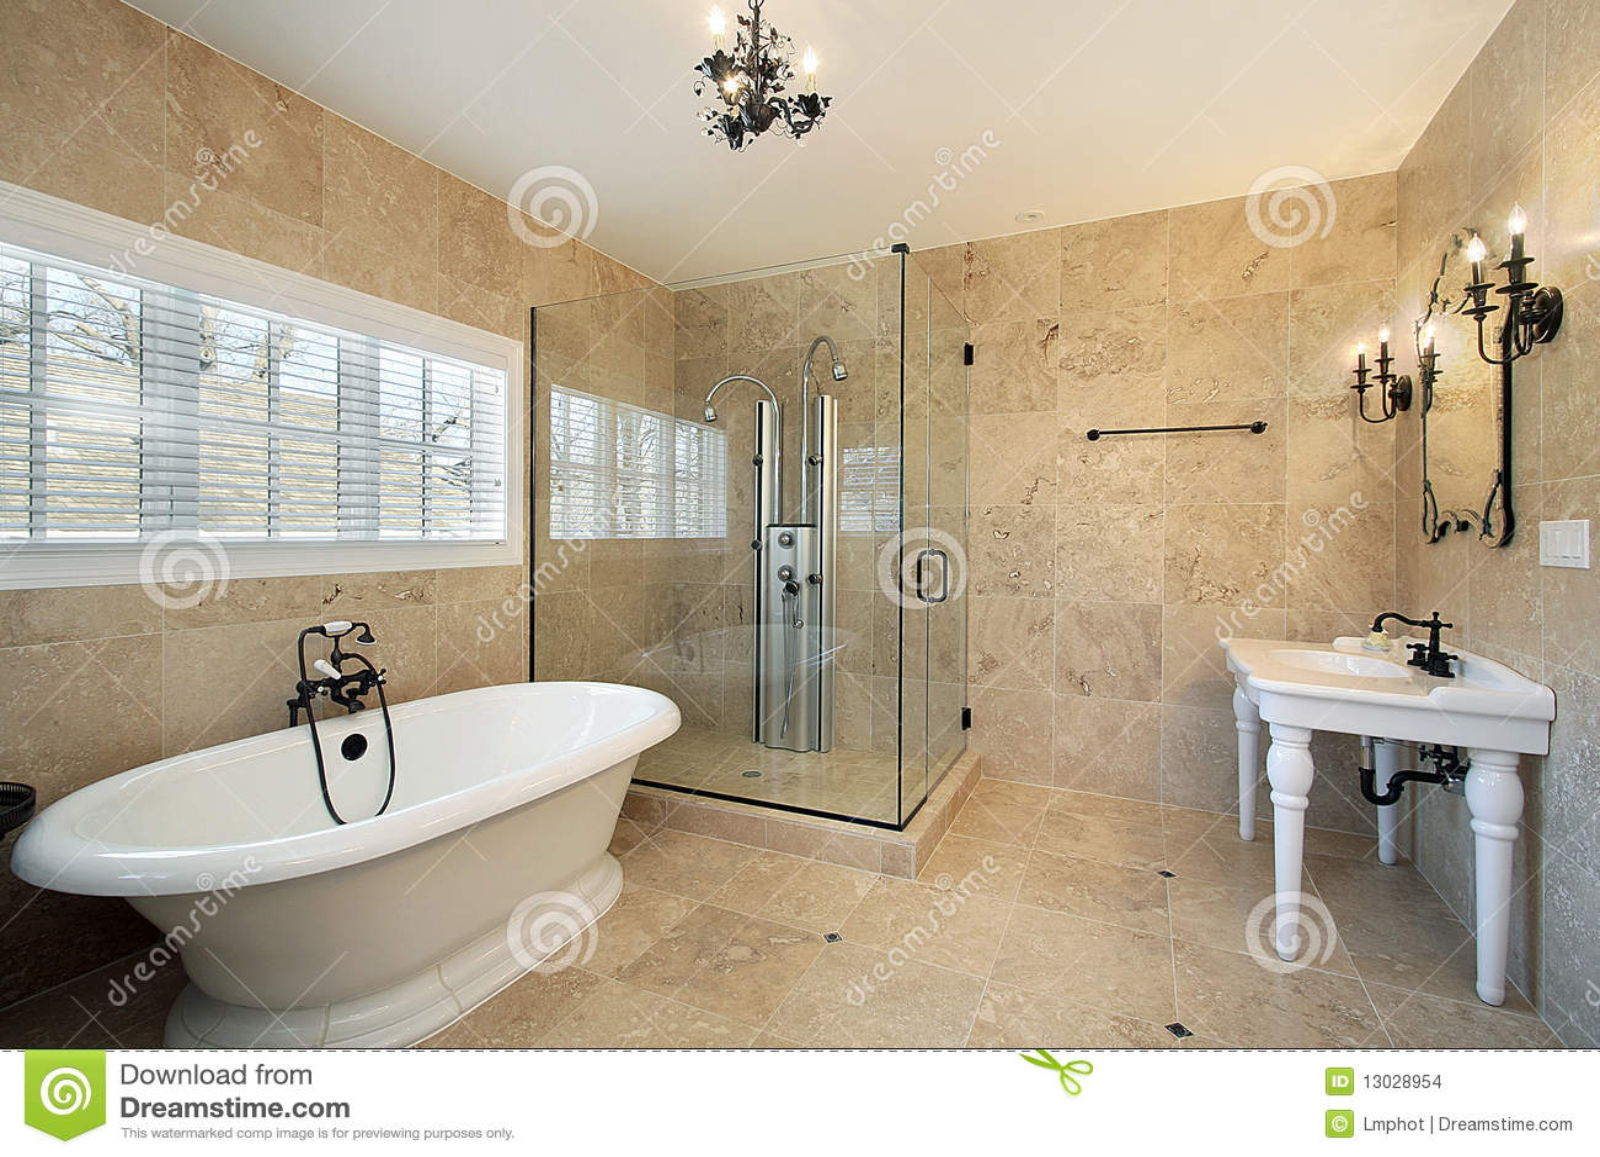 Baños Con Ducha Grande:Large Master Bathroom Shower with Glass